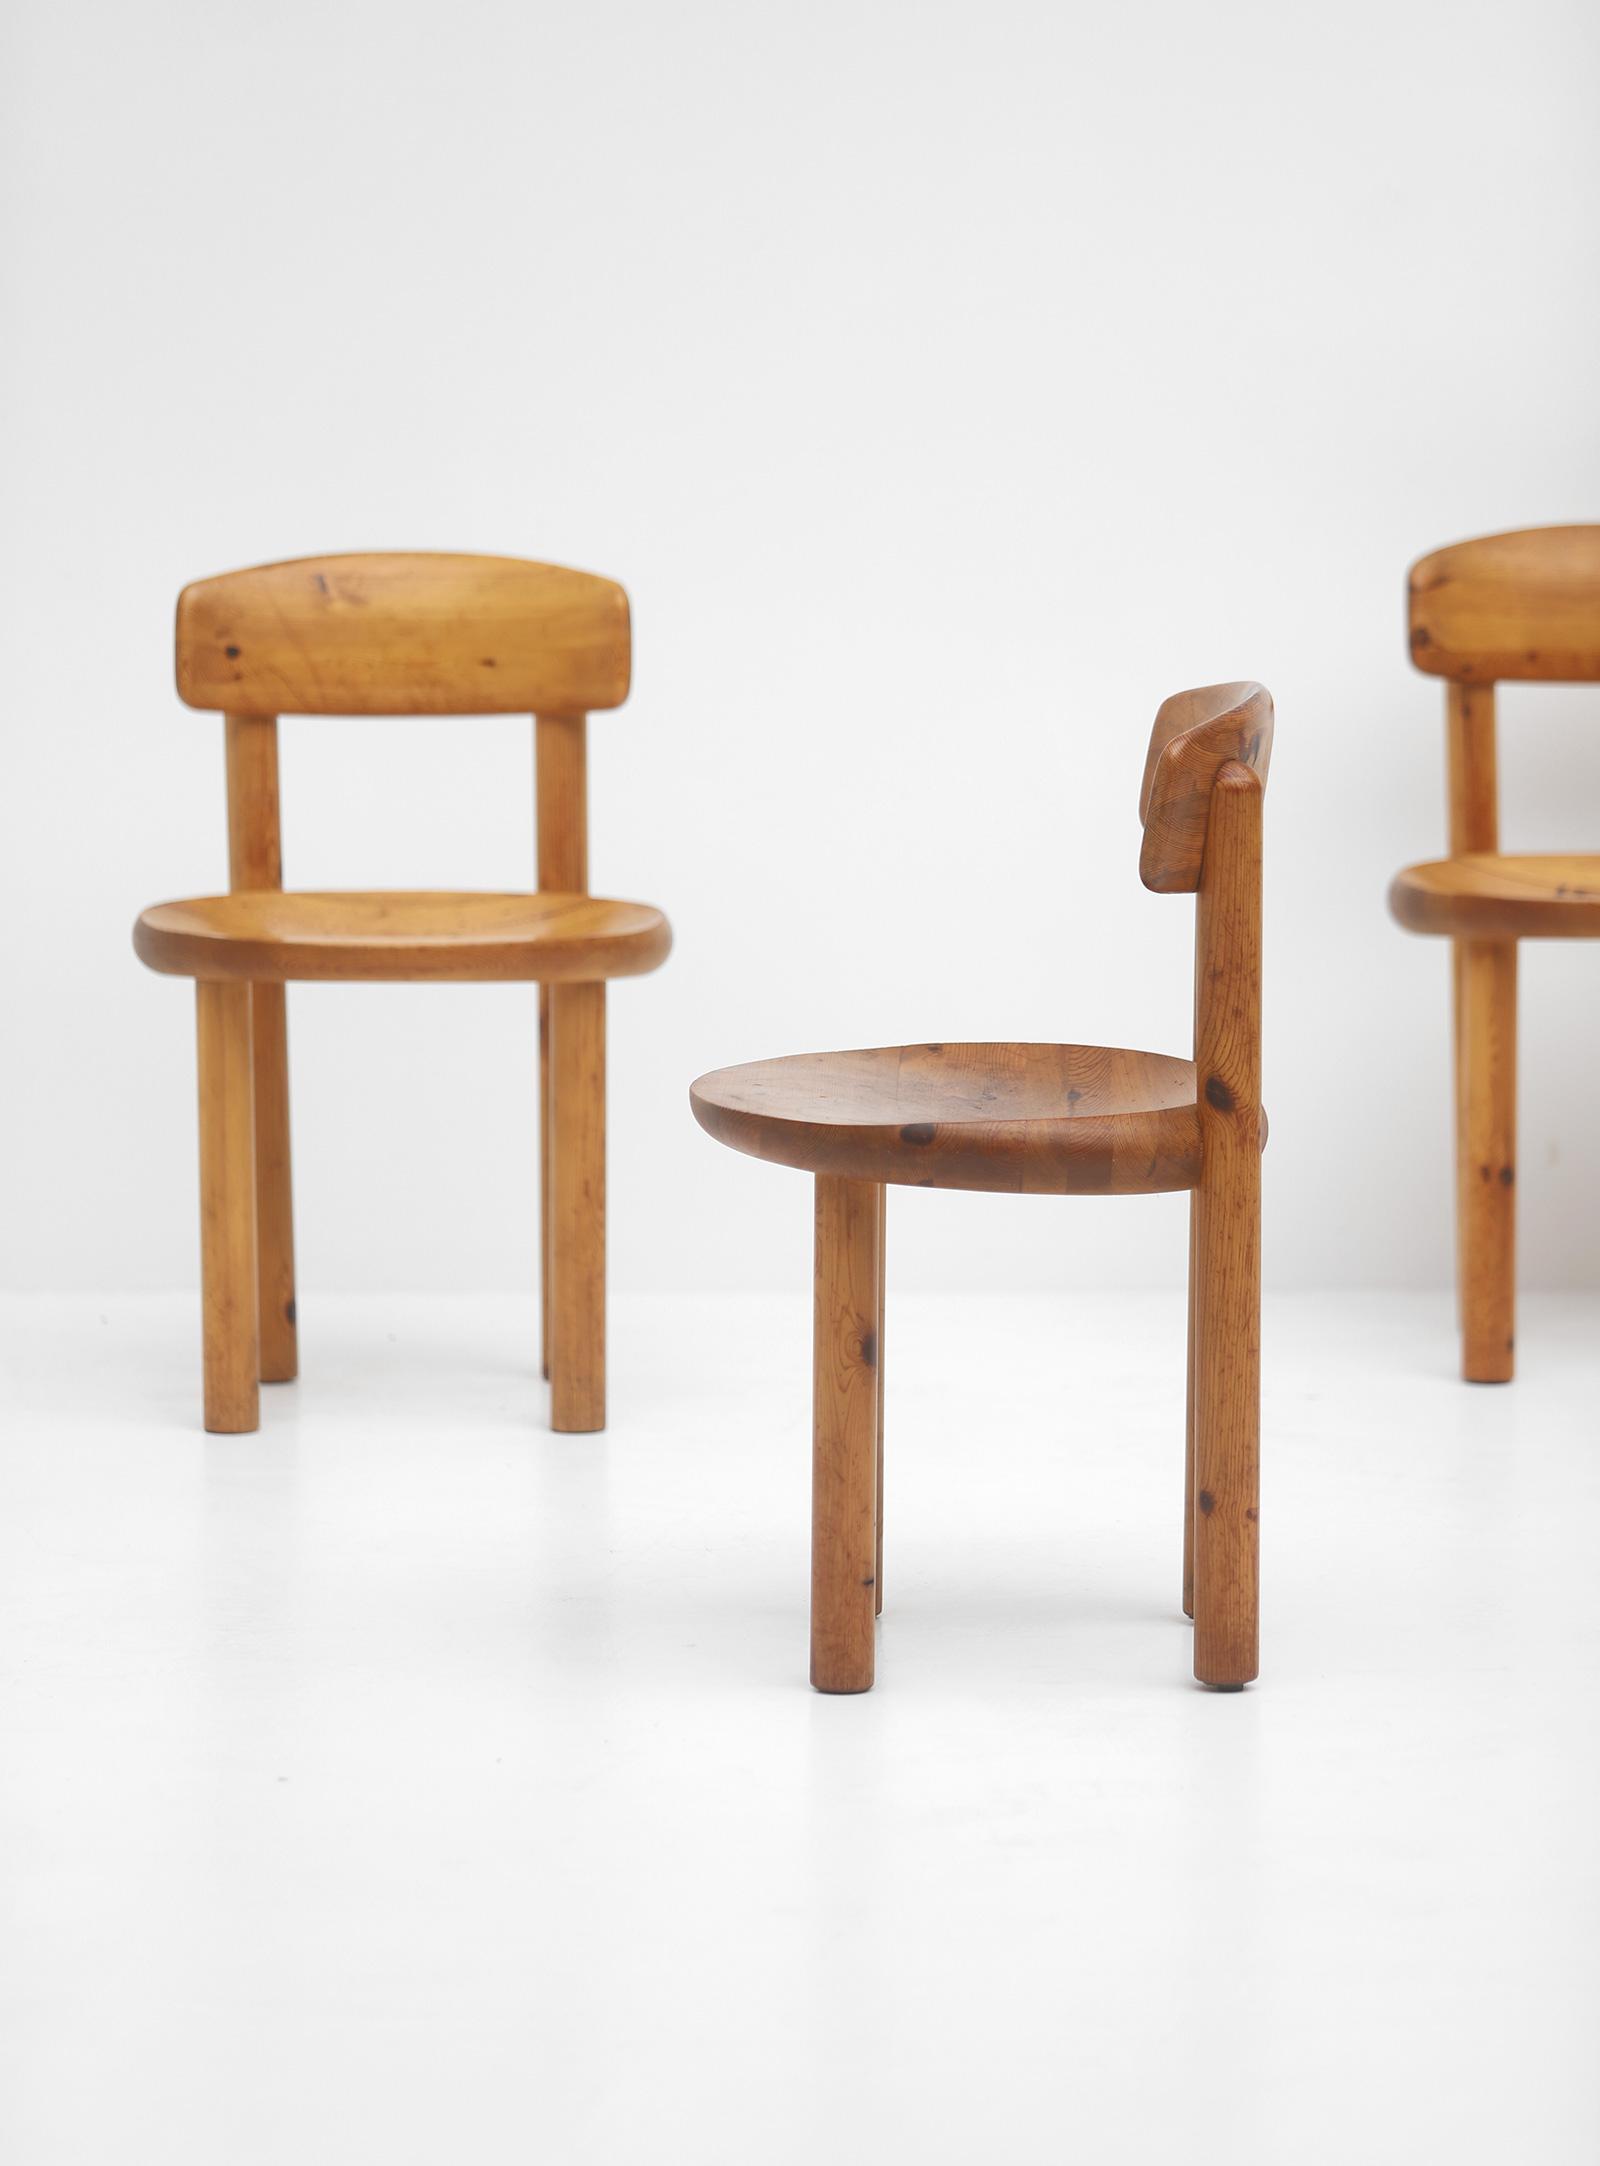 5 Daumiller Pinewood Chairsimage 2